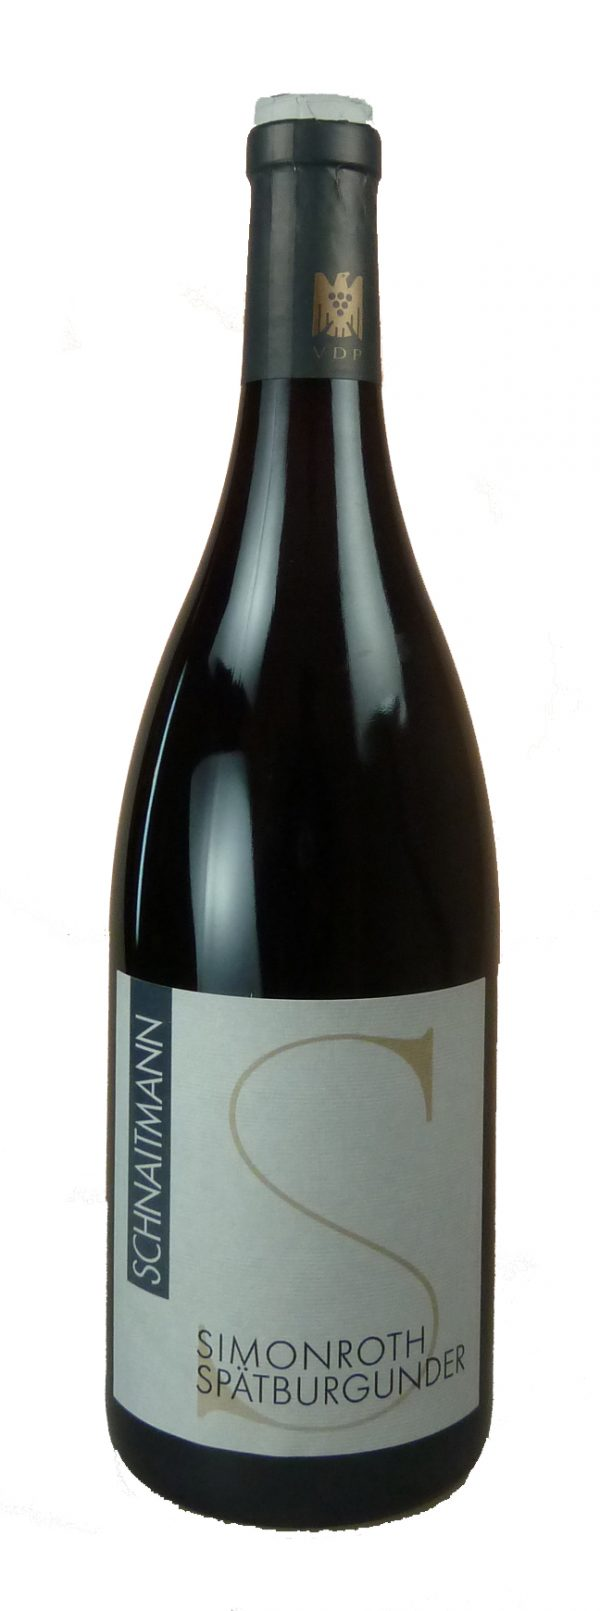 Simonroth Spätburgunder Qualitätswein trocken 2015